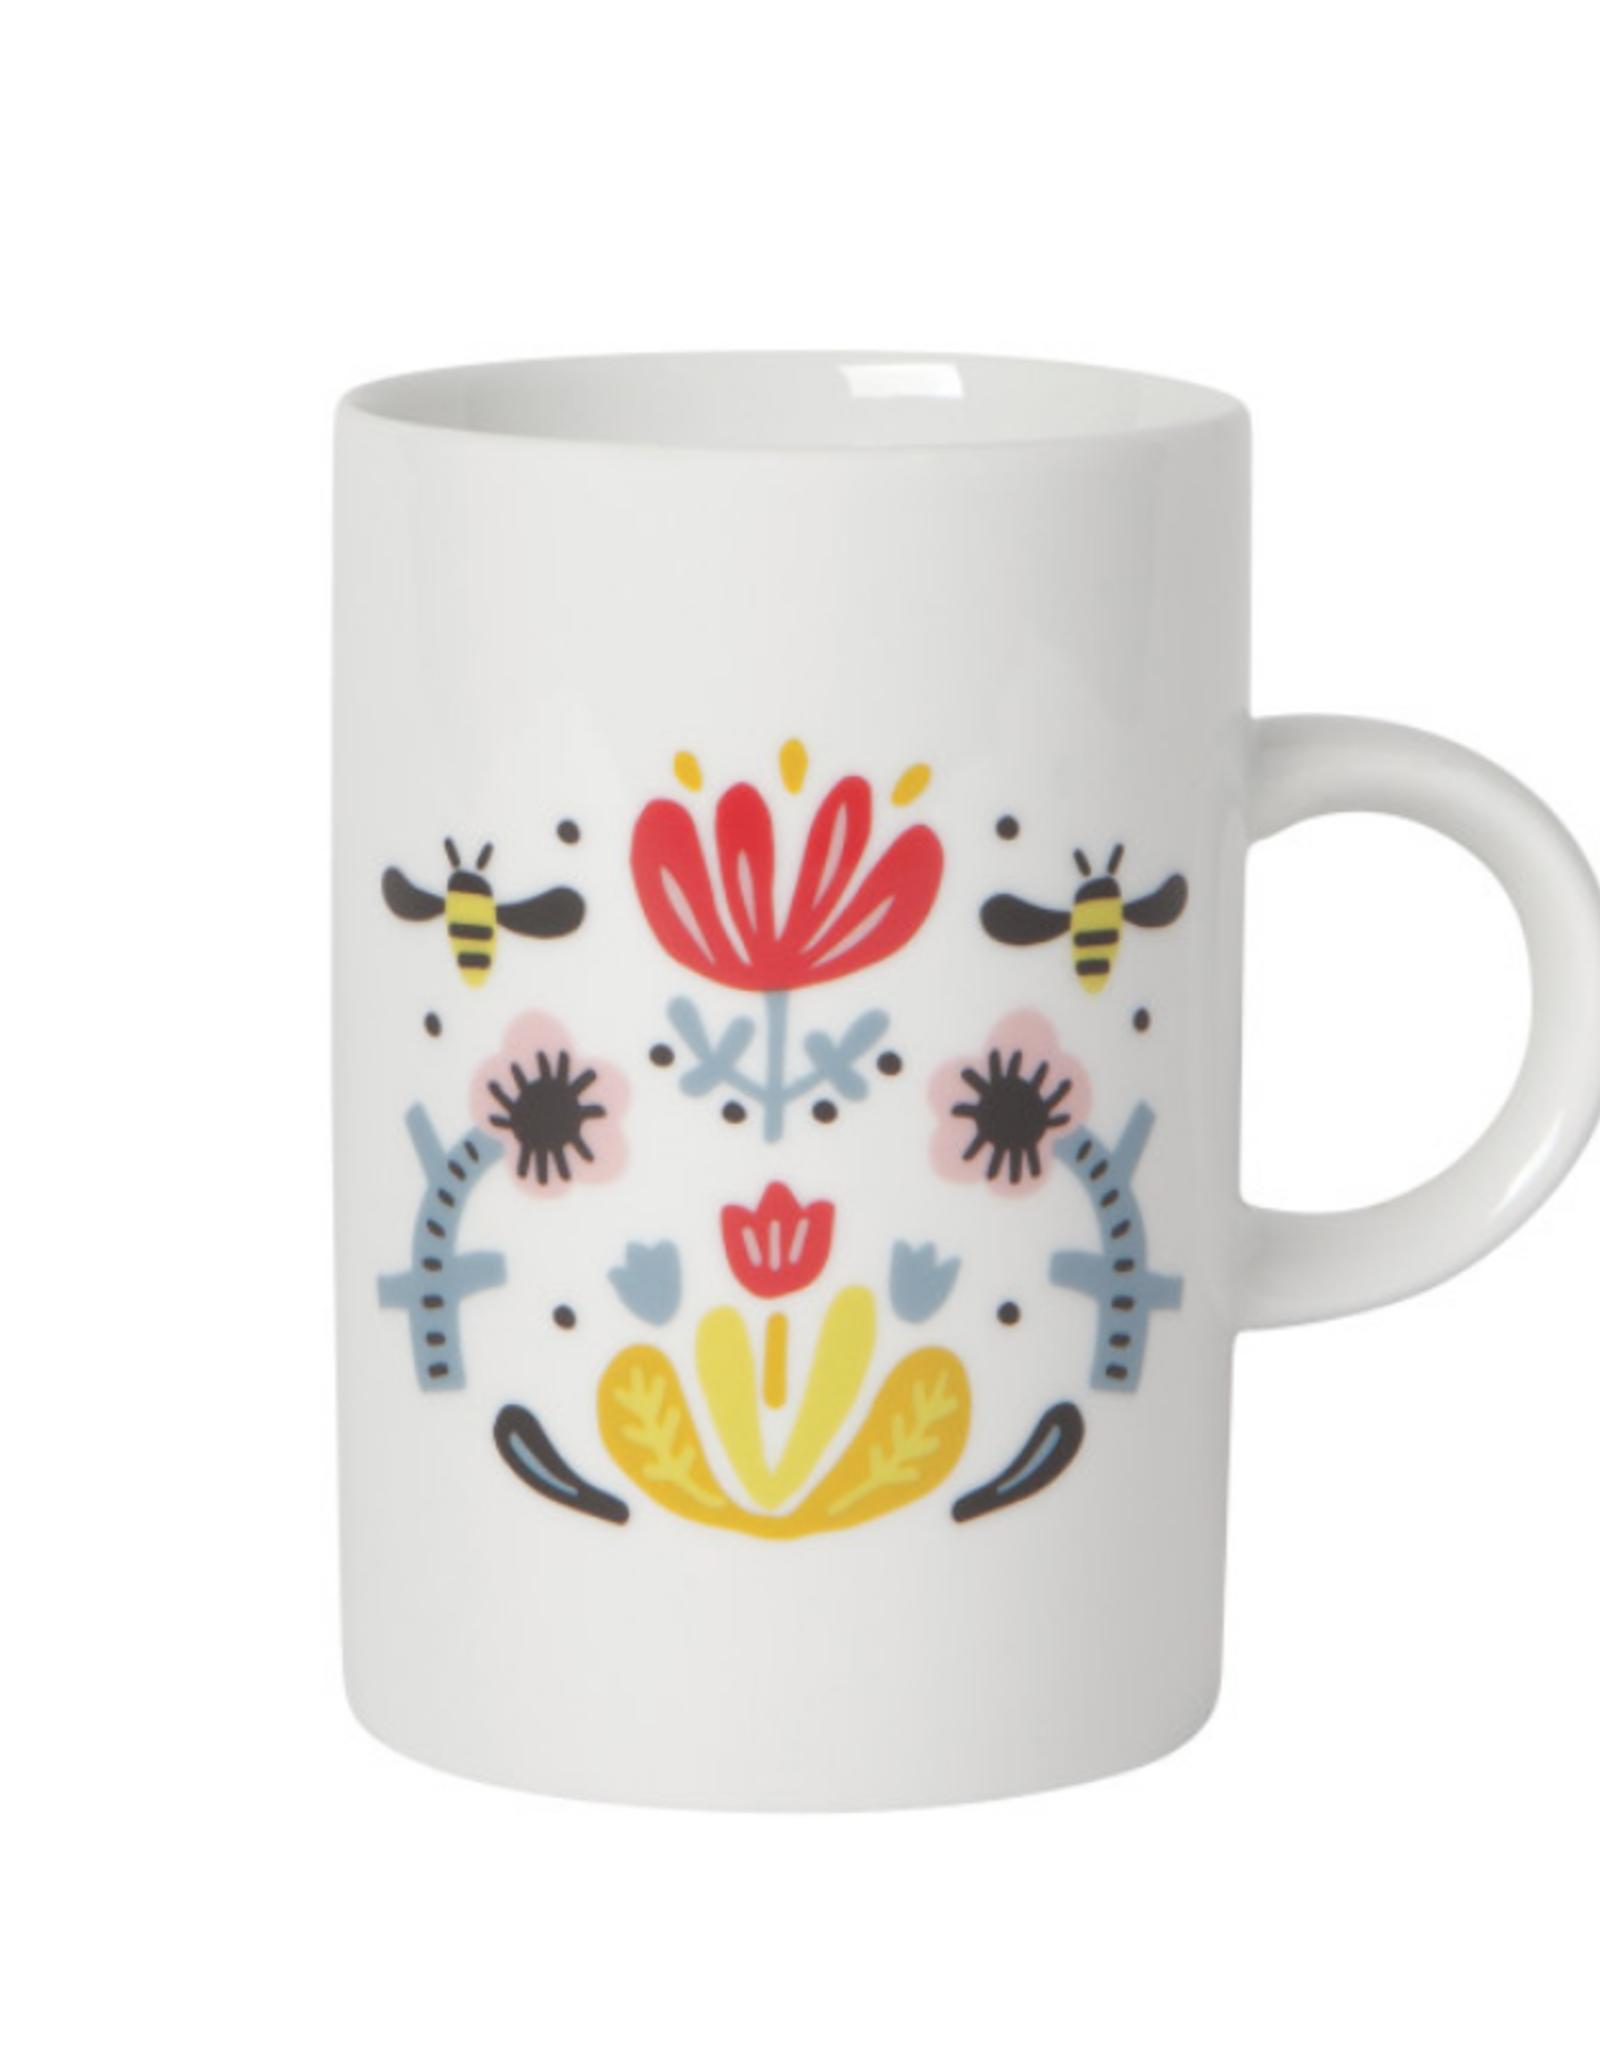 DCA - Mug/Folklore, 14oz